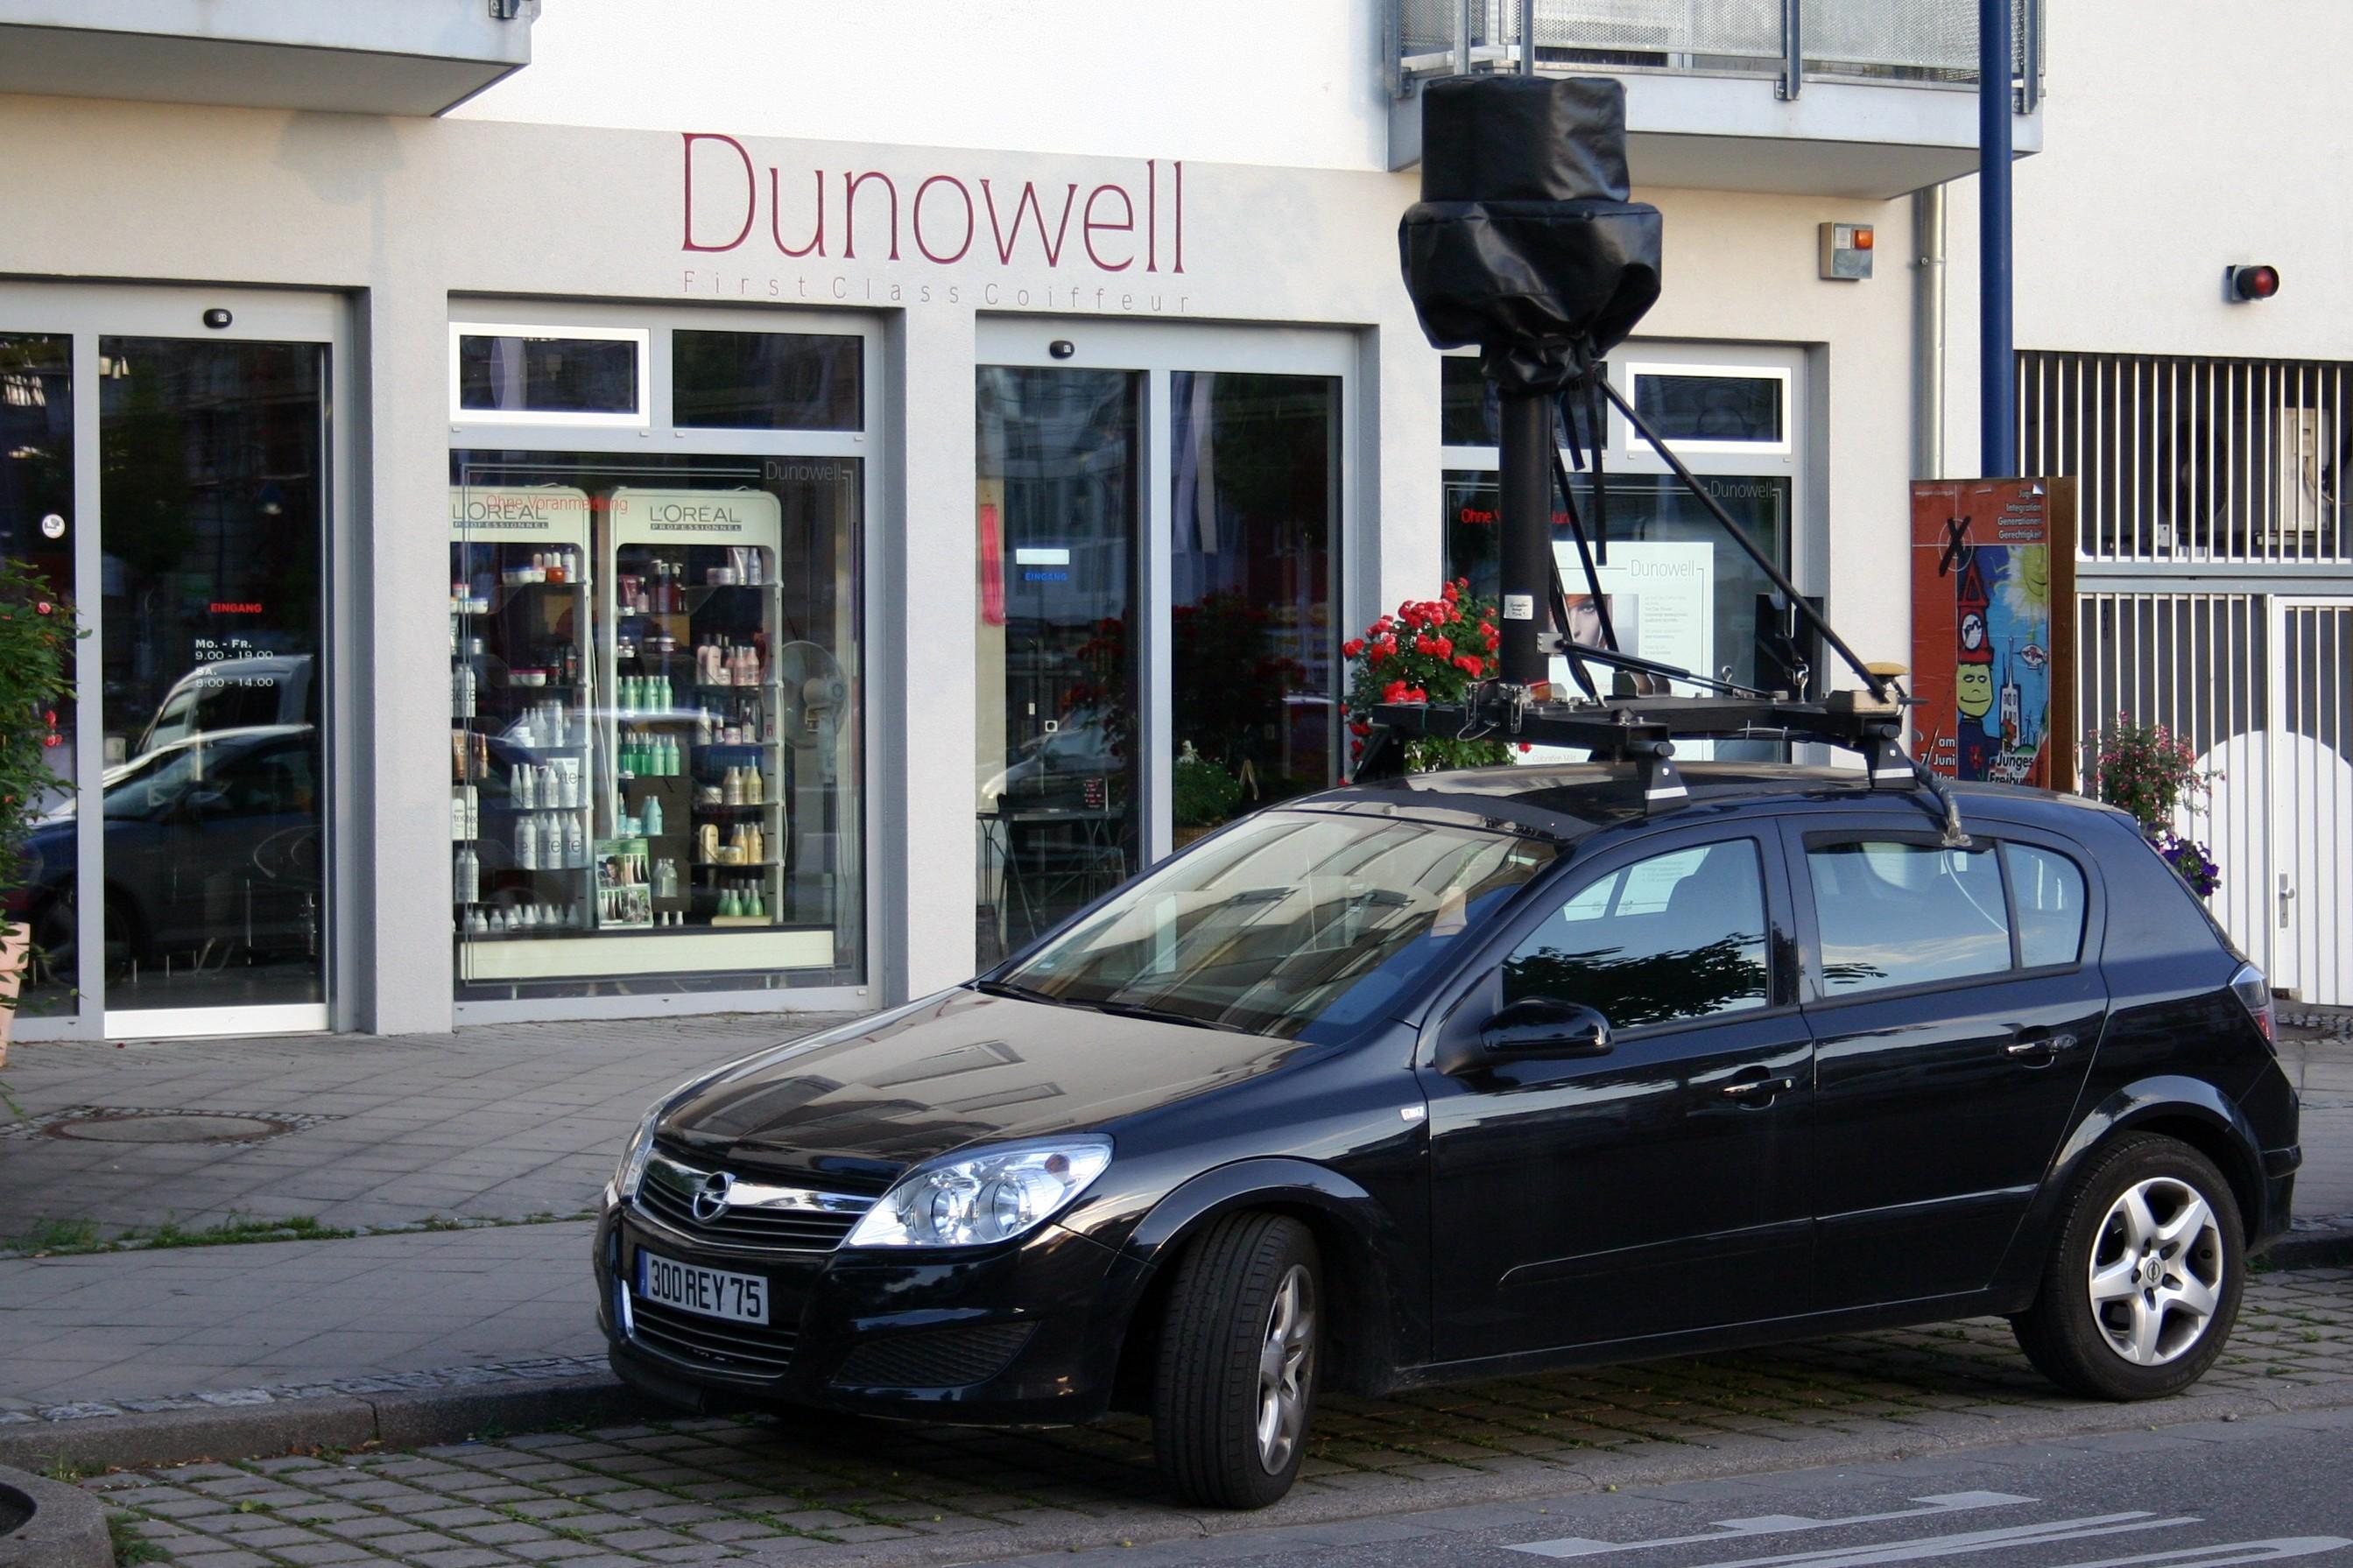 File:Google Street View Car in Freiburg im Breisgau.jpg - Wikimedia ...